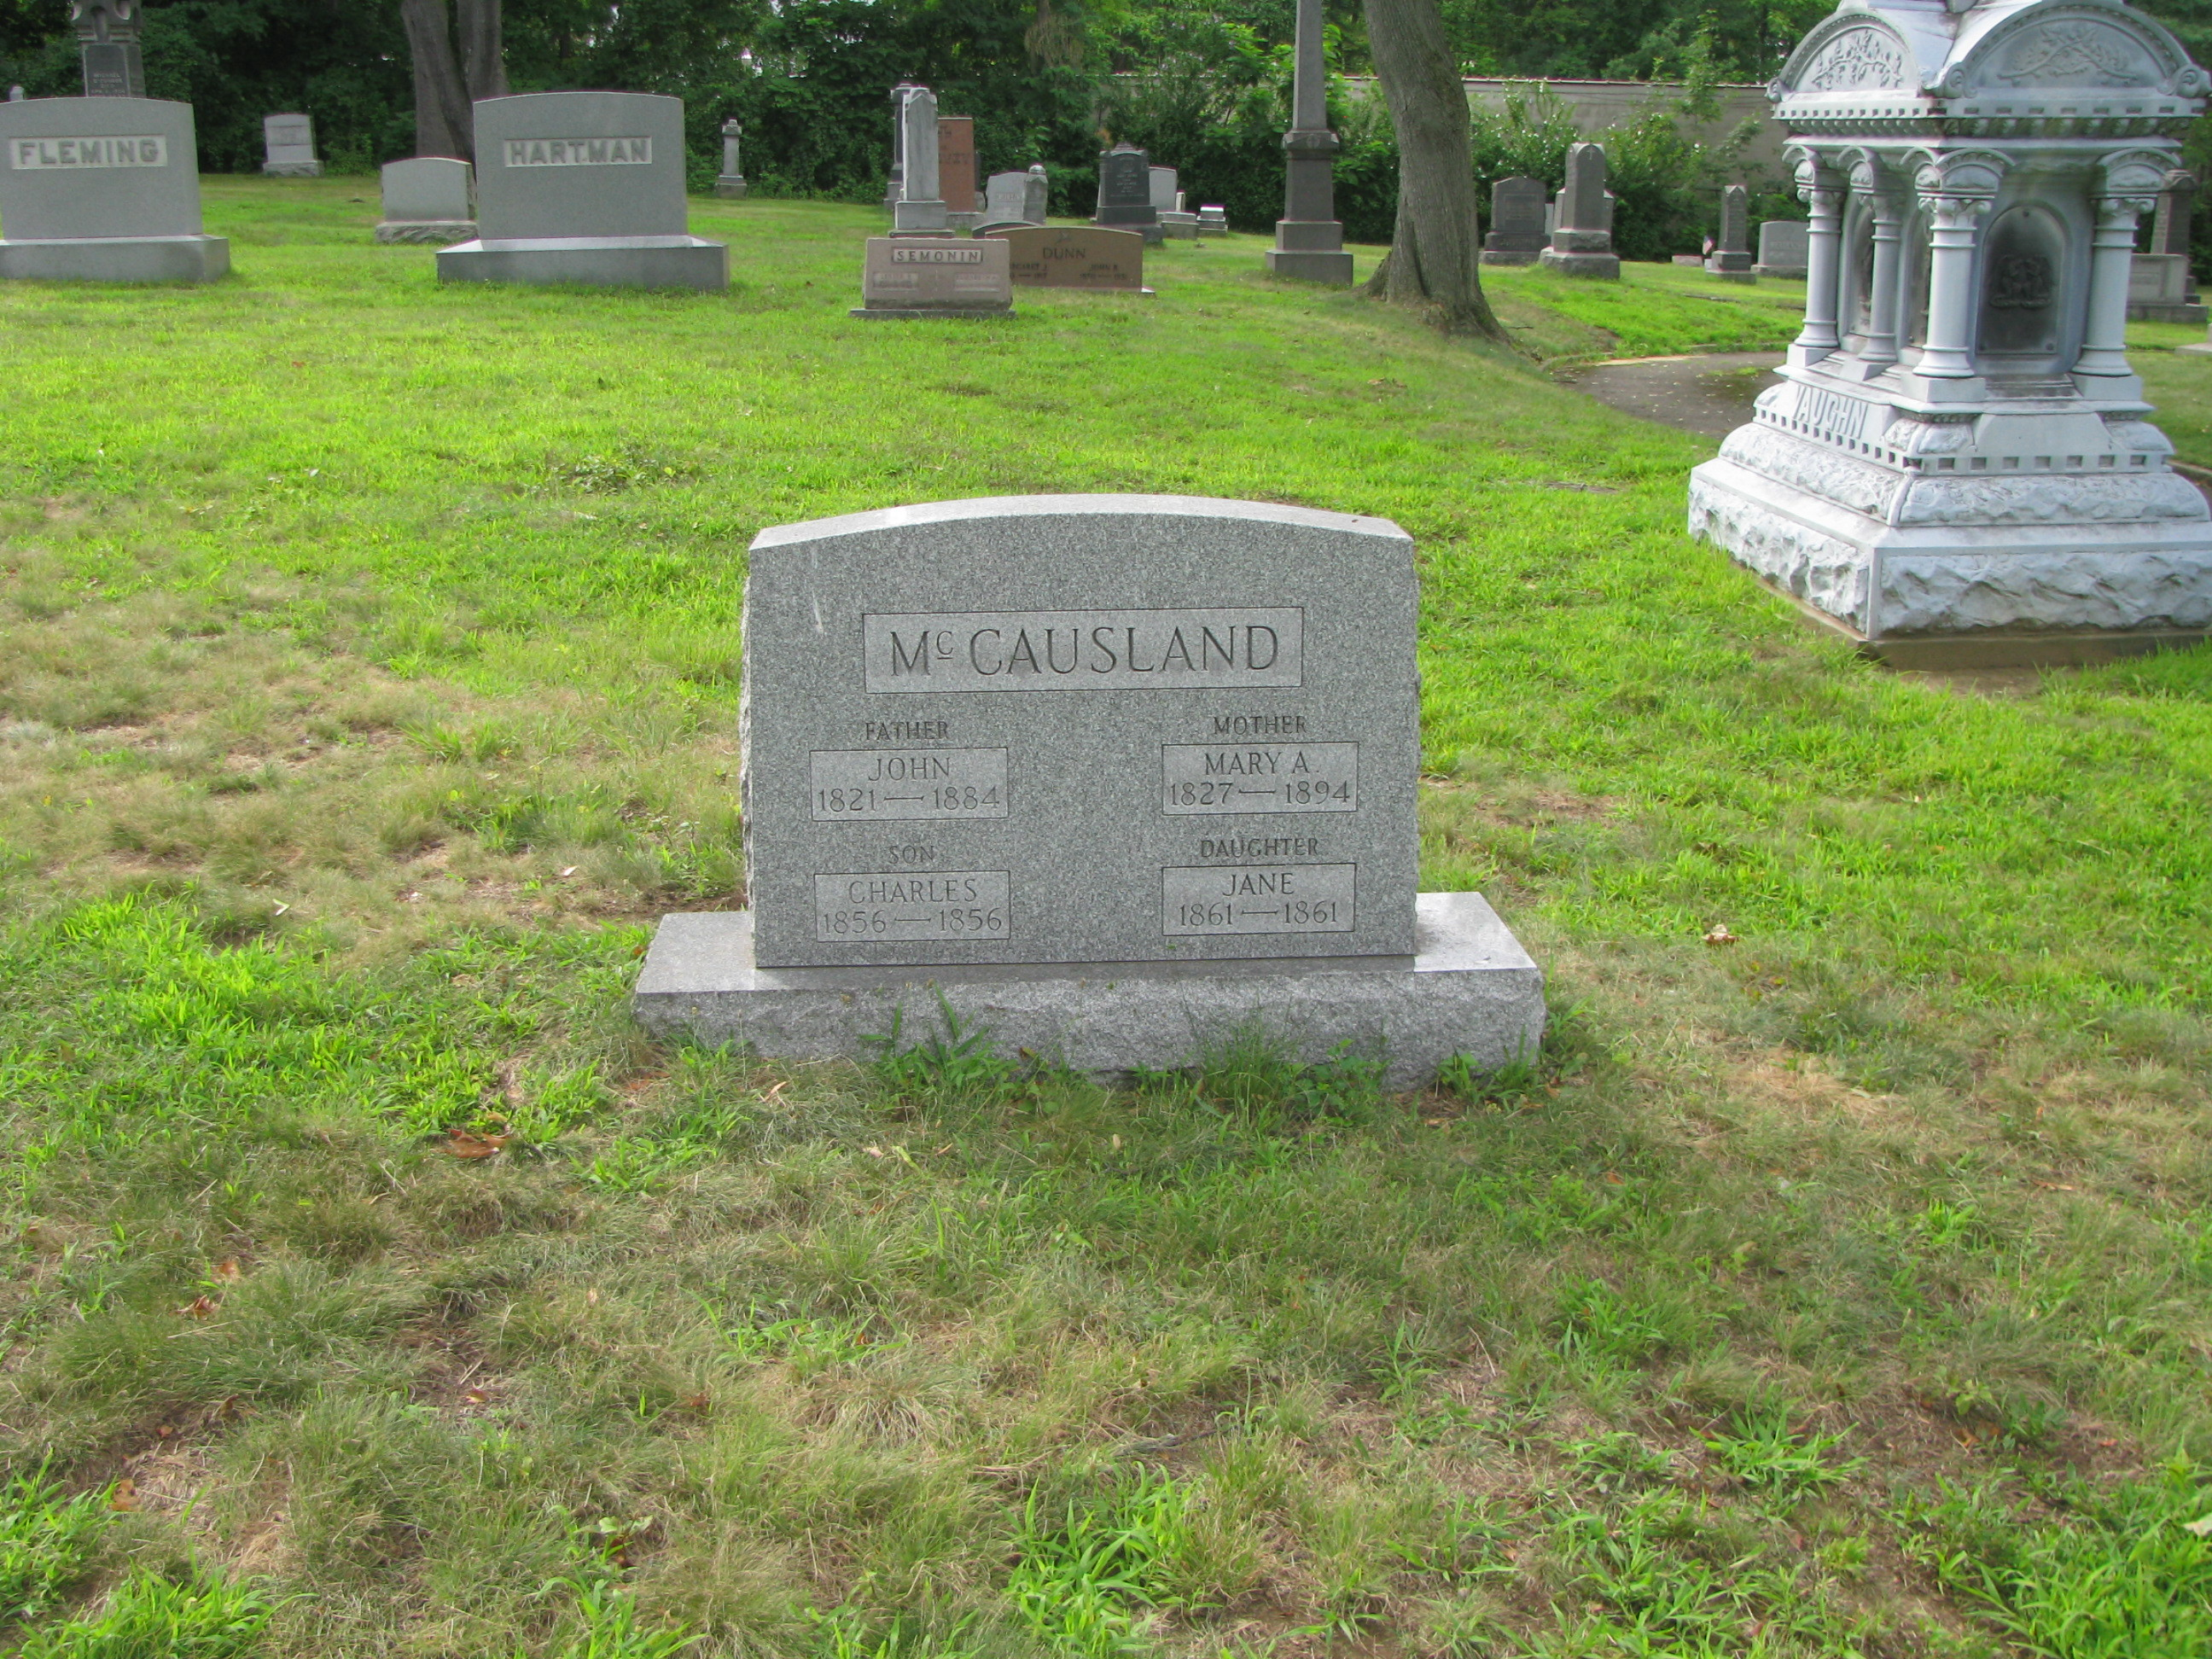 Mary McQuillan